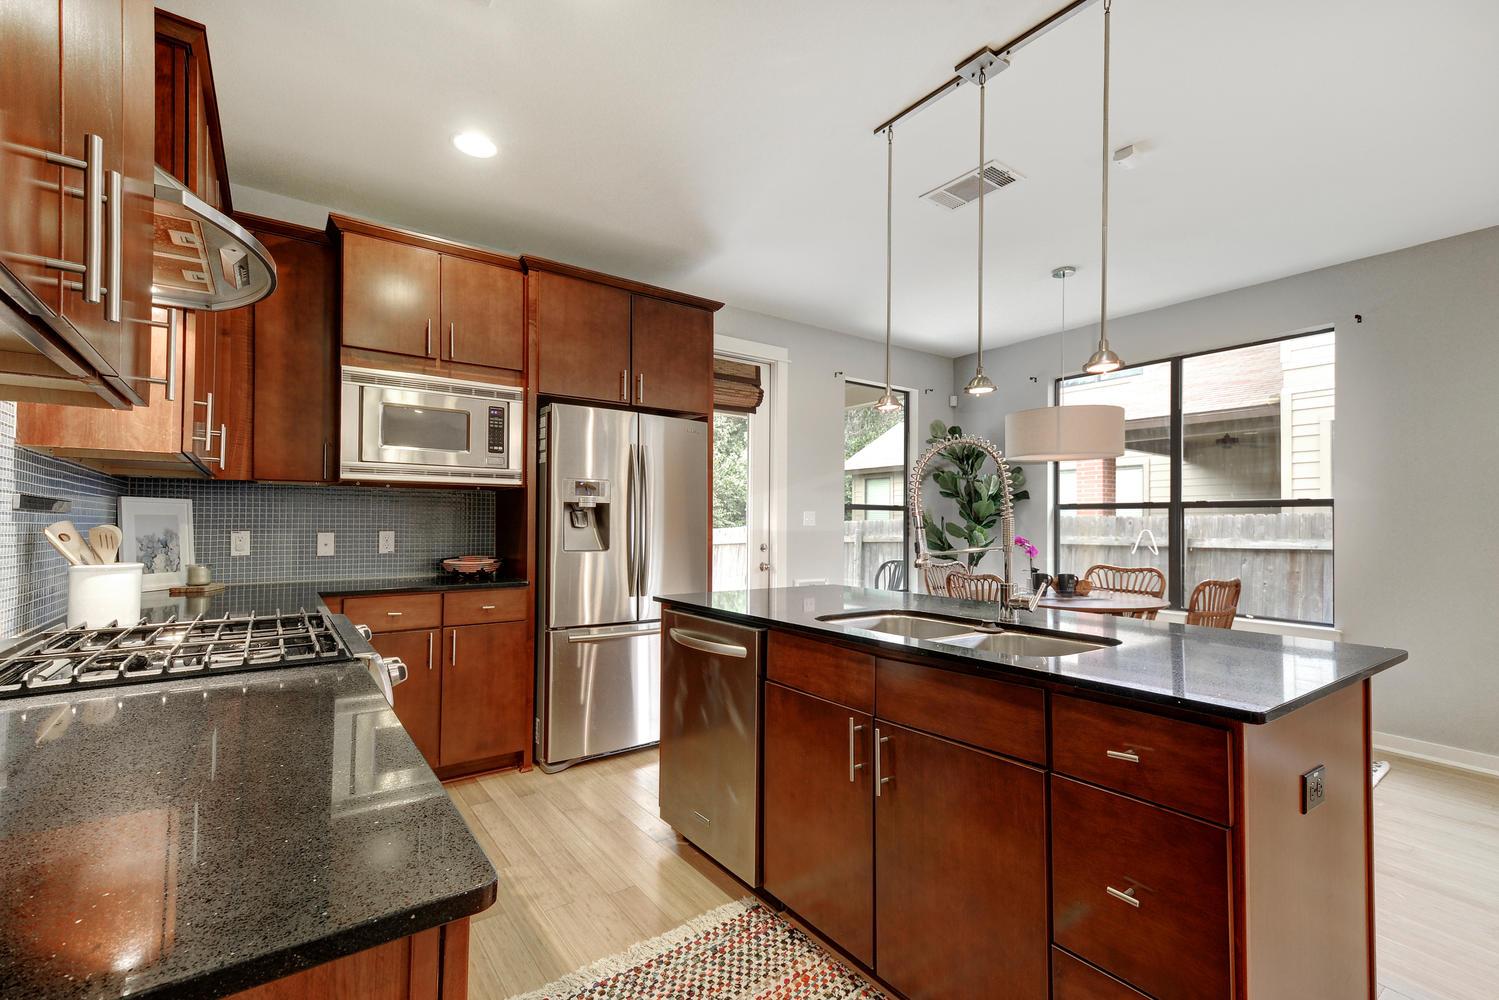 2909 Corbin Ln-large-009-15-Kitchen 002-1499x1000-72dpi.jpg